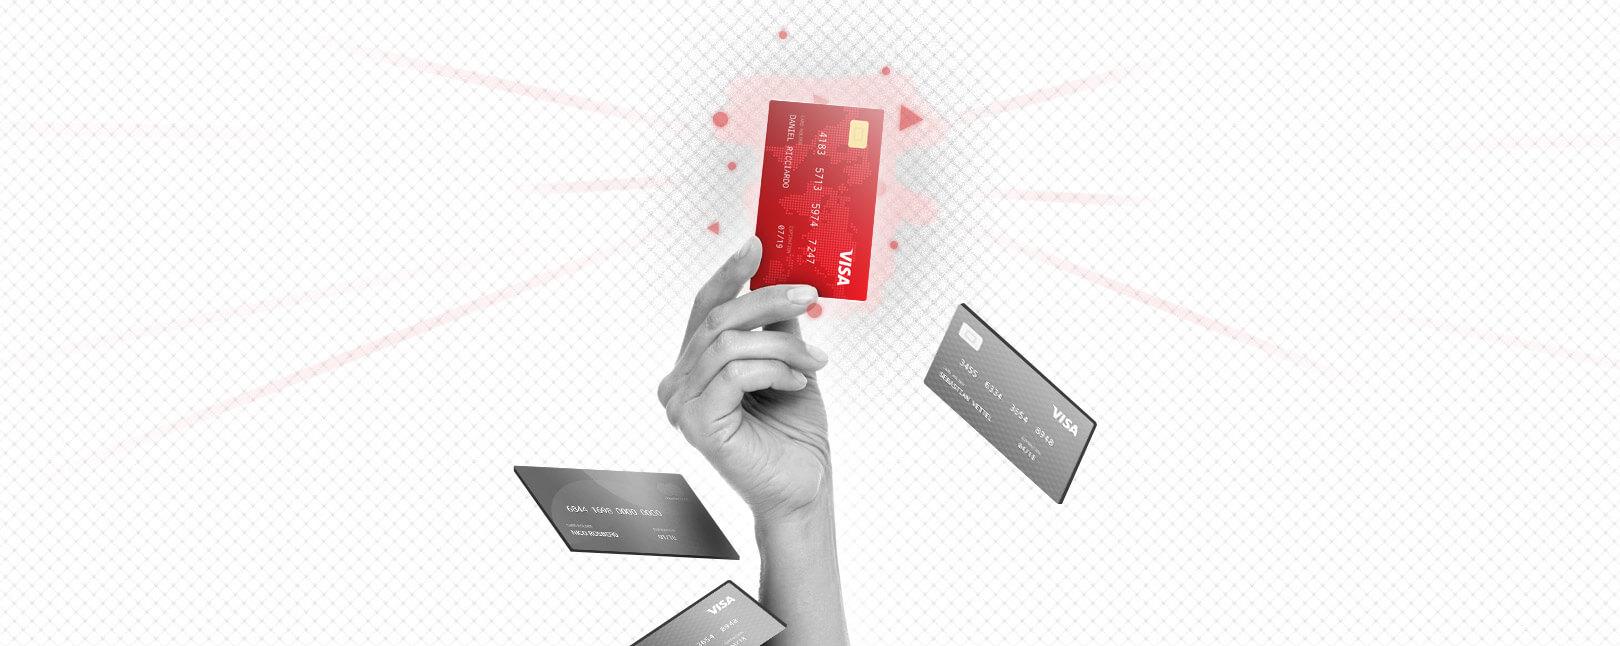 Card_linked Marketing